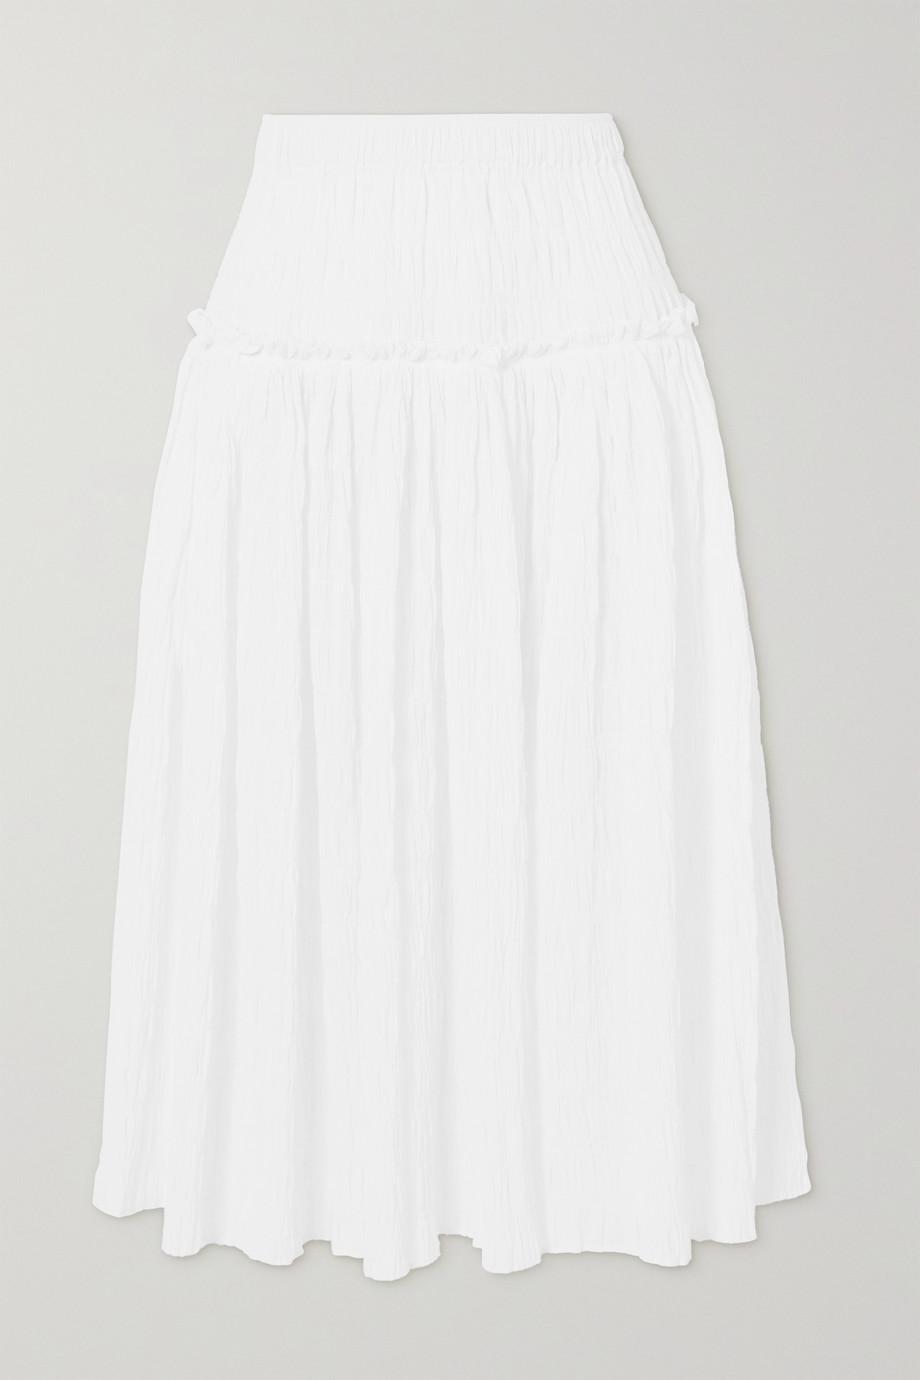 Mara Hoffman Alejandra tiered smocked organic stretch-cotton midi skirt